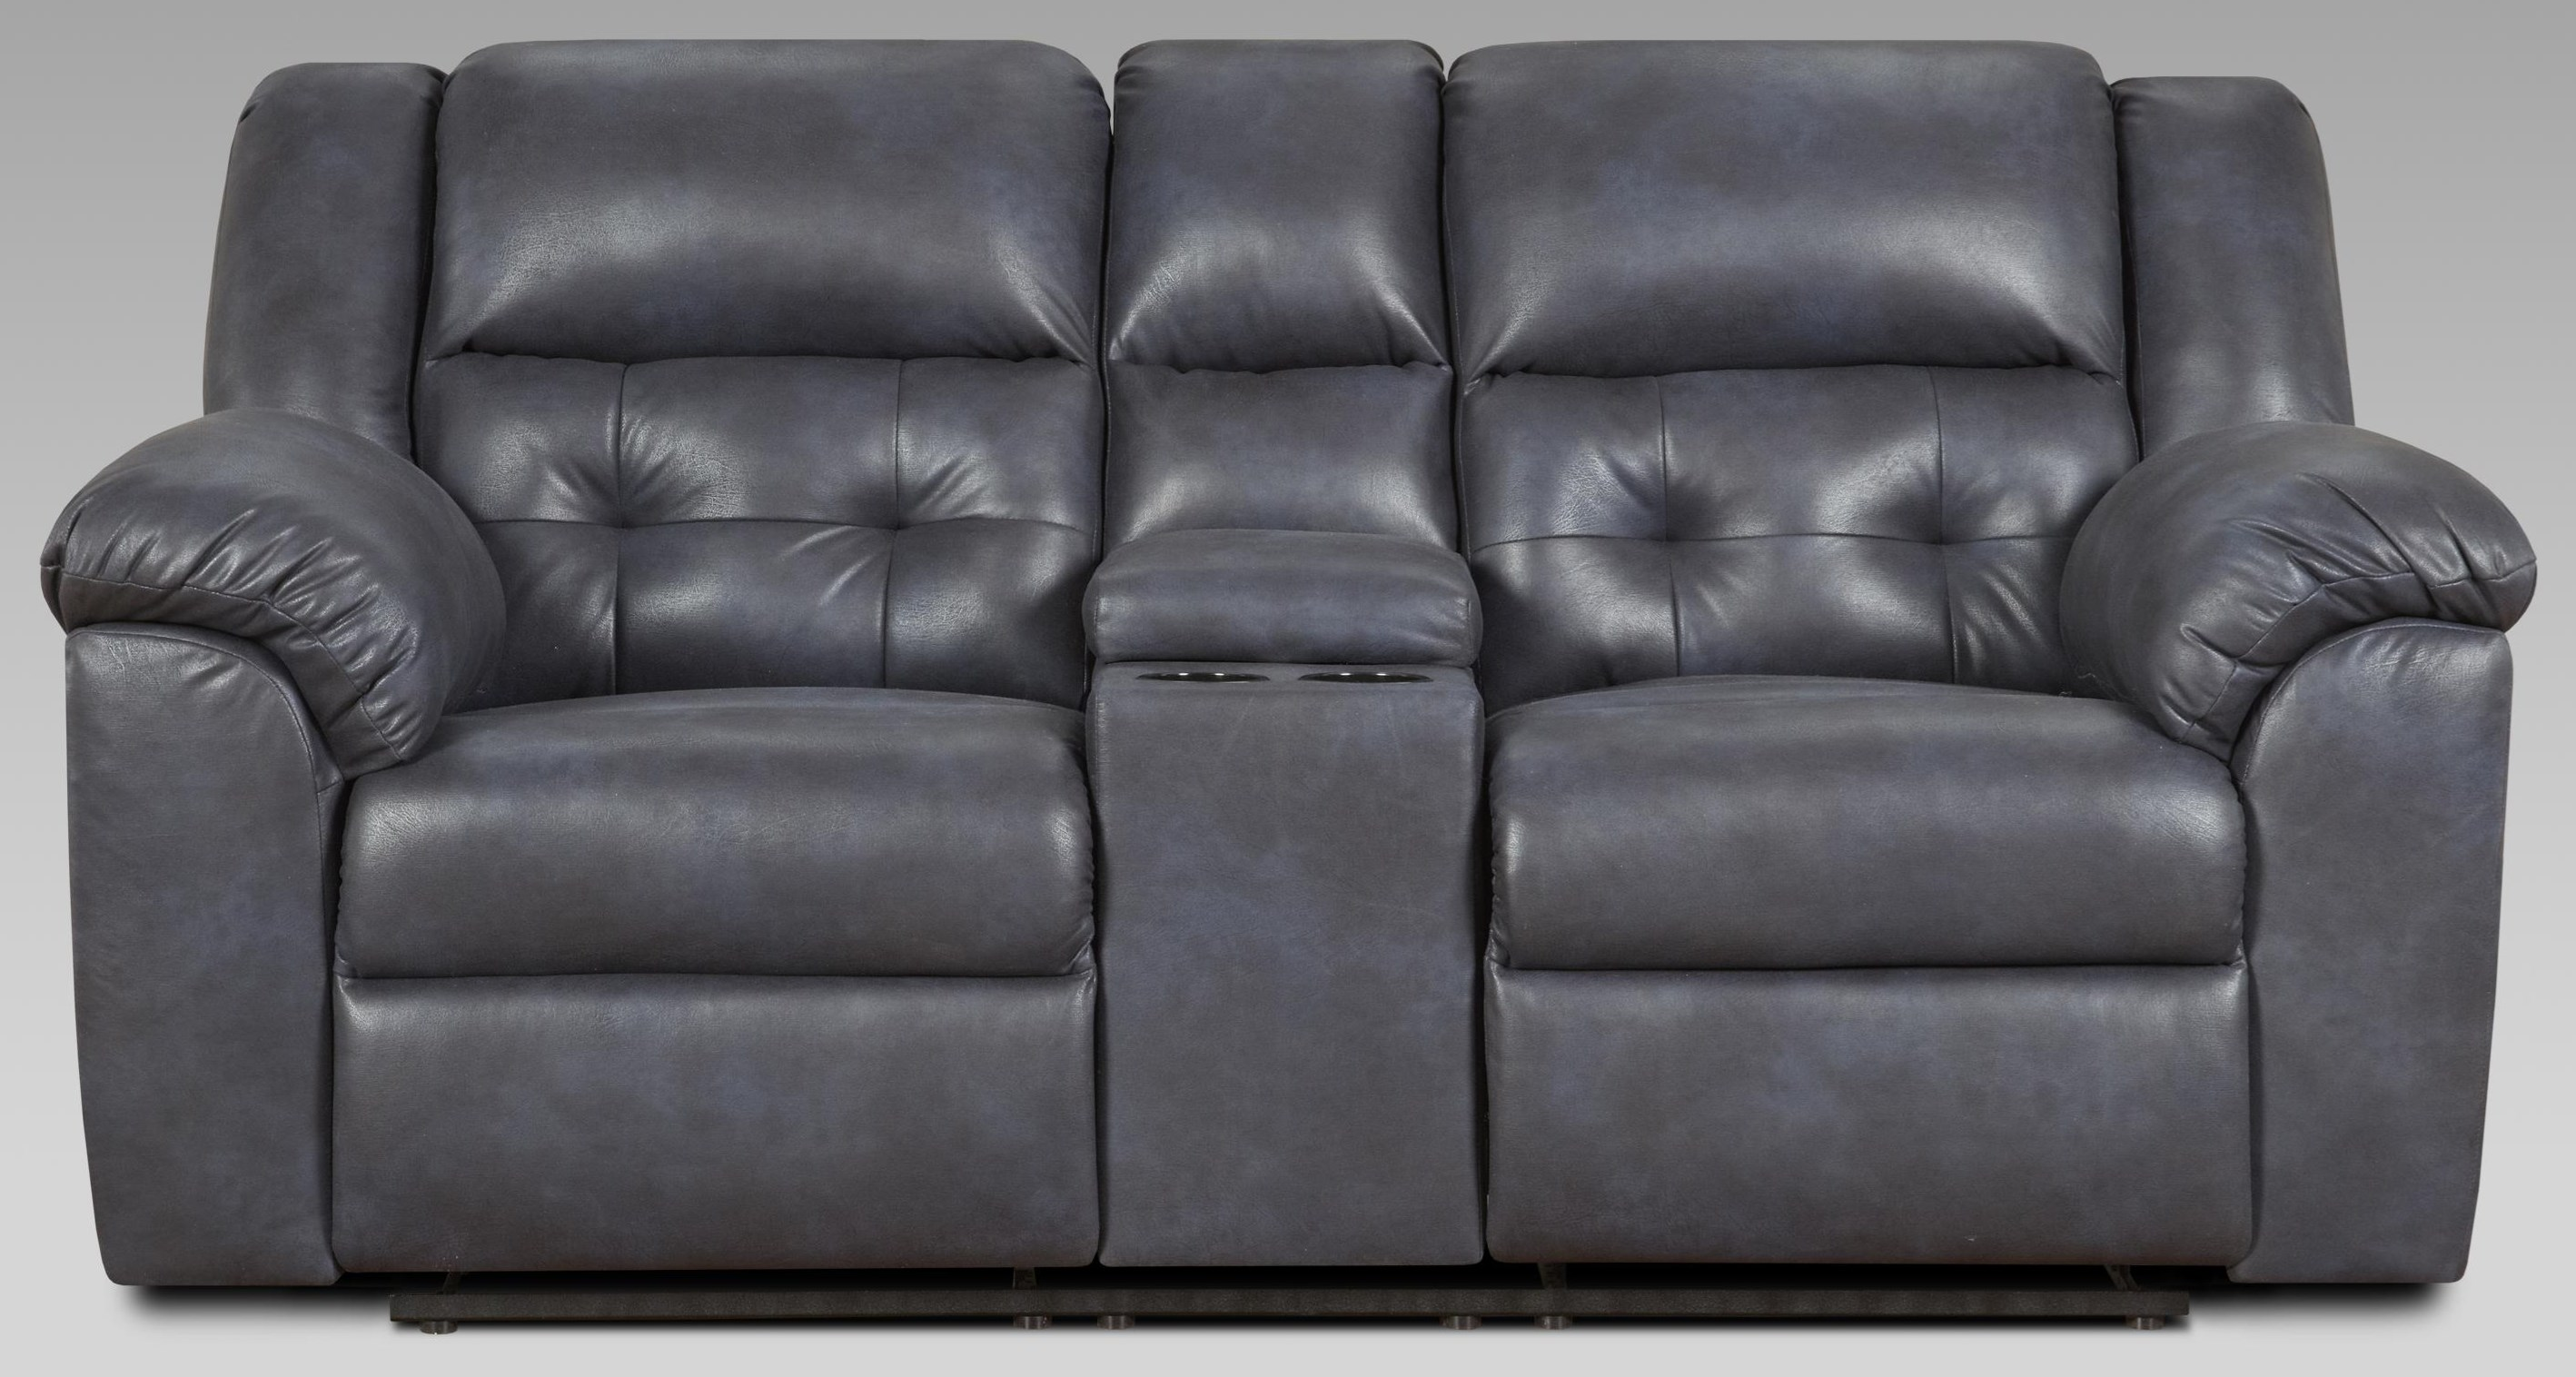 1500 Telluride Indigo Power Reclining Console Loveseat by Affordable Furniture at Furniture Fair - North Carolina